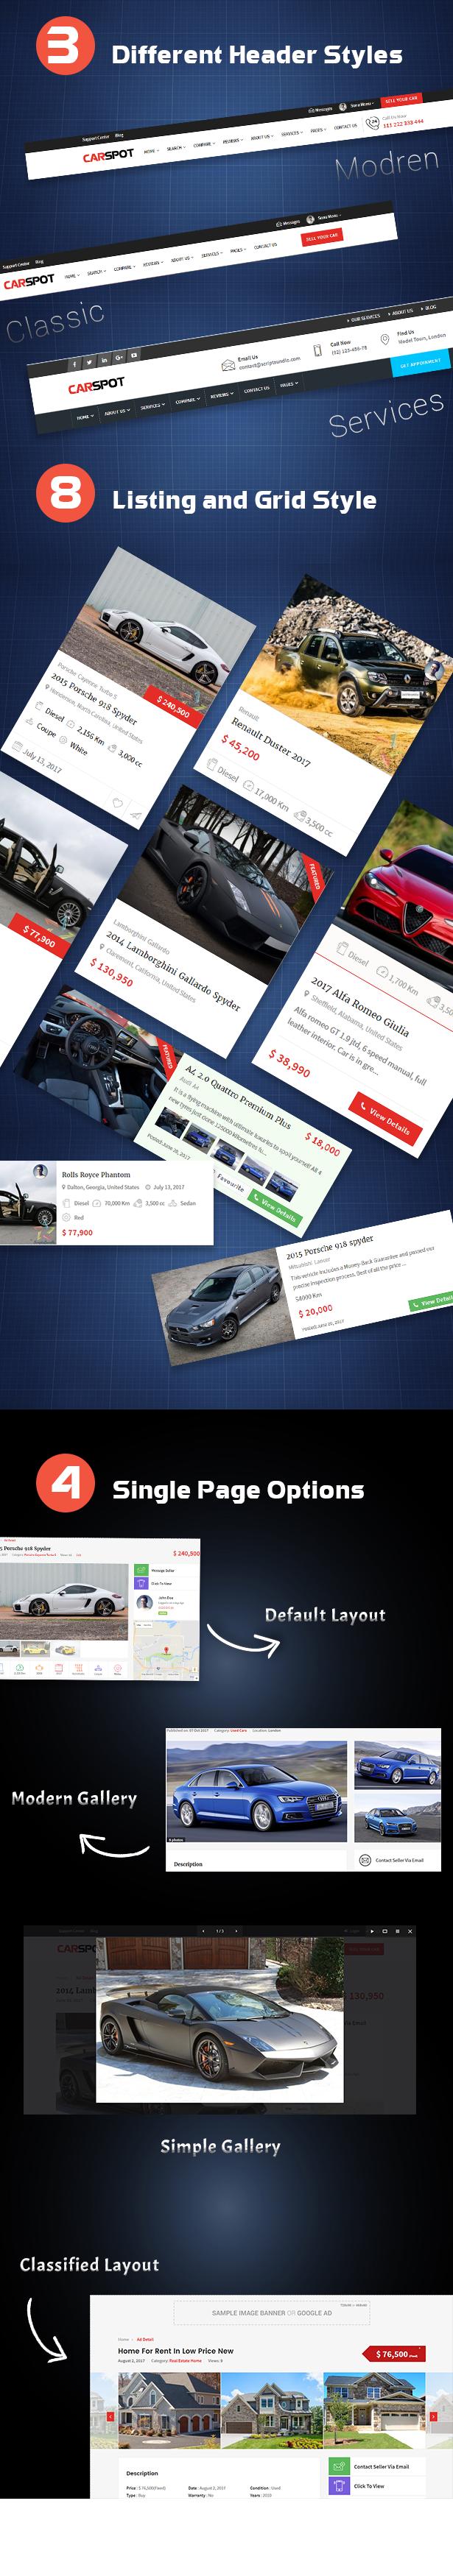 CarSpot v2.2.9 –汽车经销商官网Wordpress主题插图32